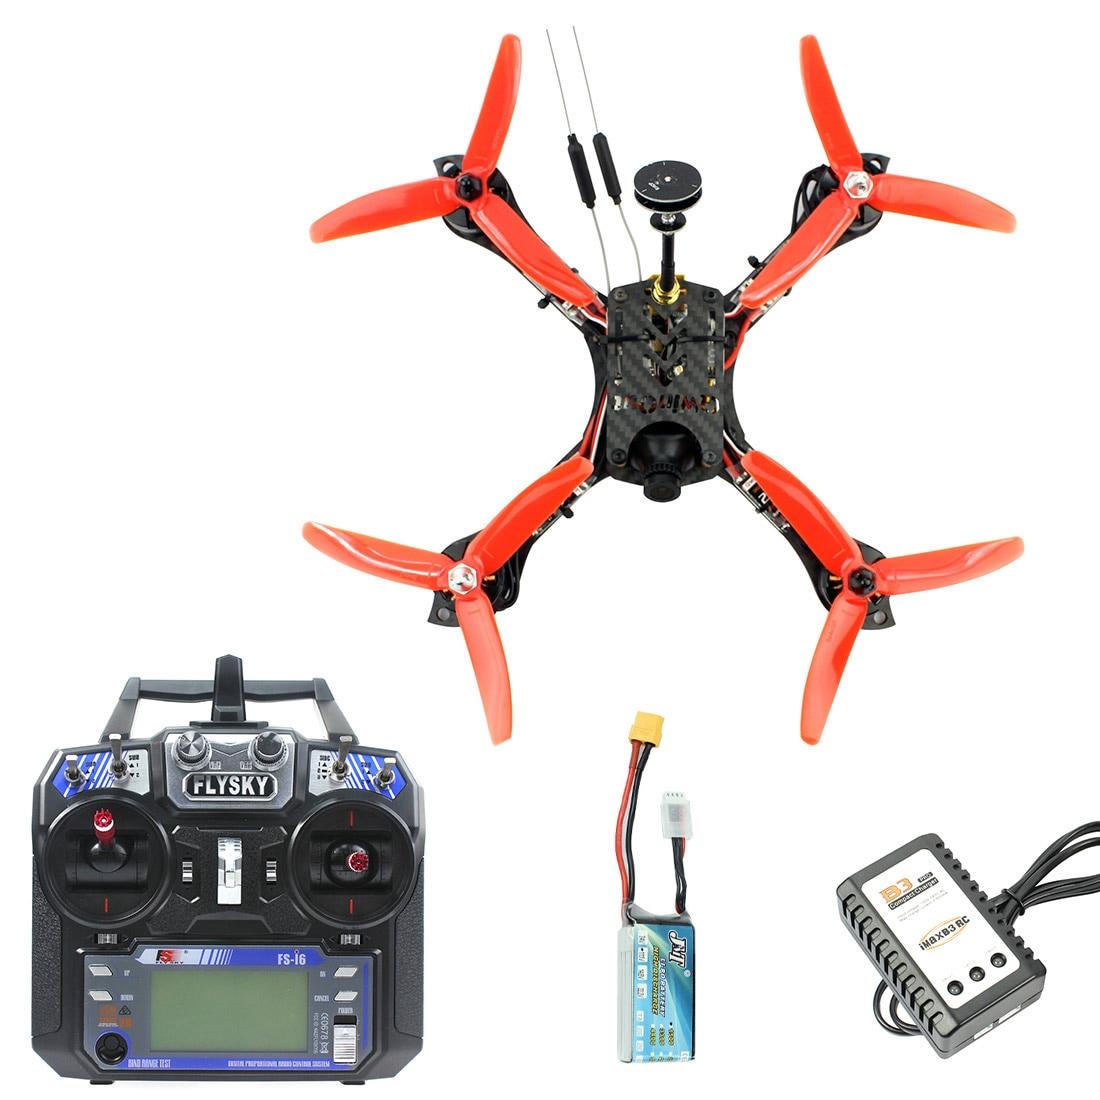 JMT 210mm RTF FPV hexacóptero Racer aviones Dron con Mini Flysky FS I6 transmisor F4 Pro (V2) partes de control de vuelo